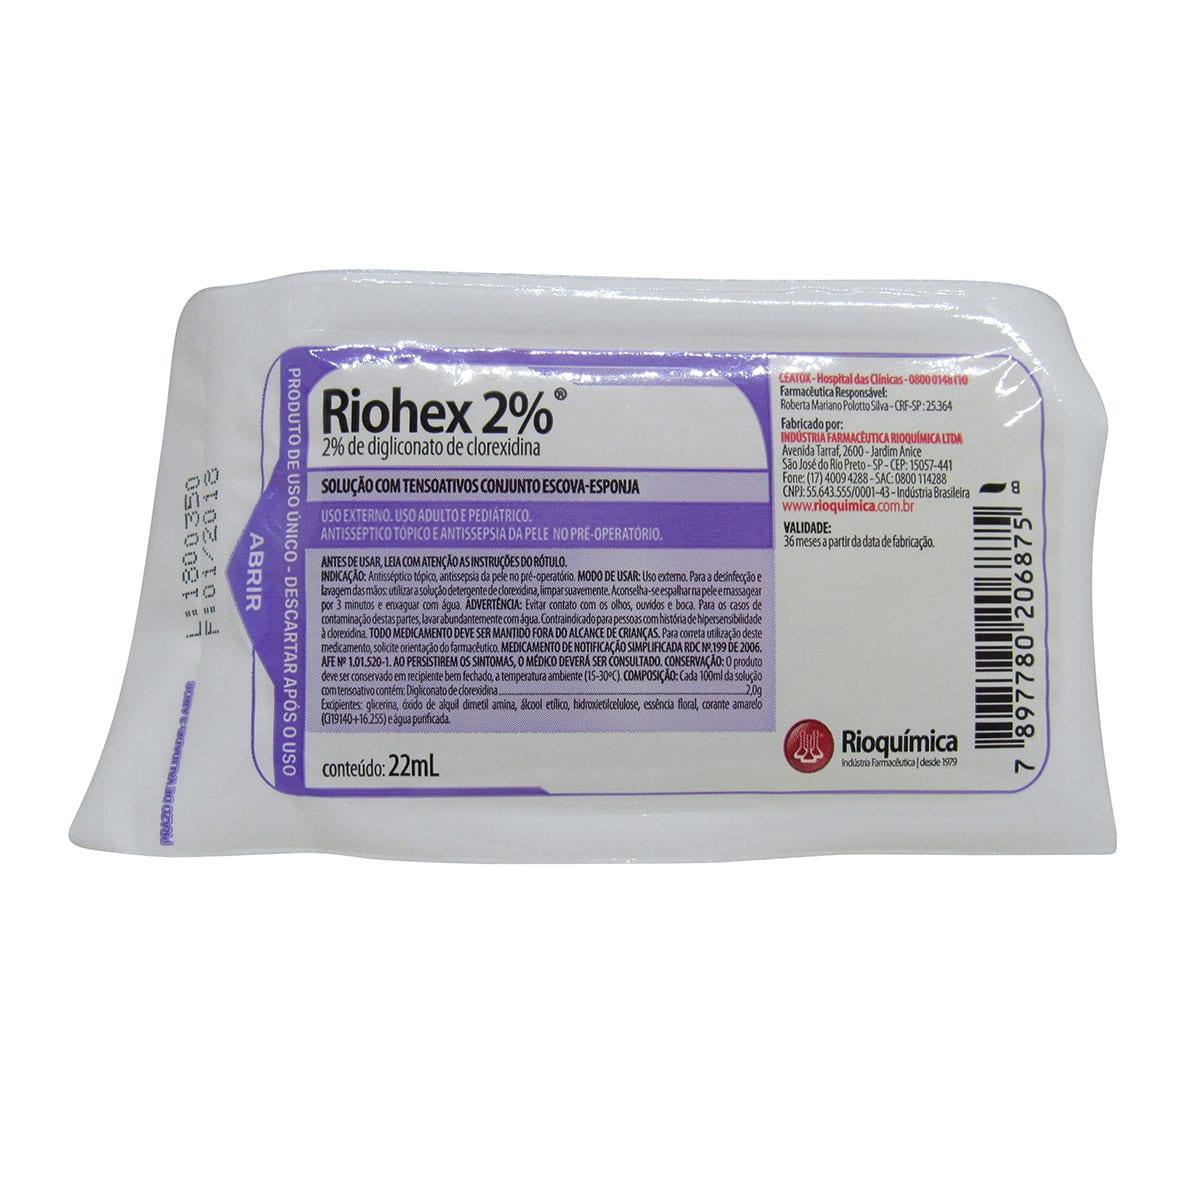 Escova Assepsia Riohex Clorexidina 2% Rioquímica Kit 20un